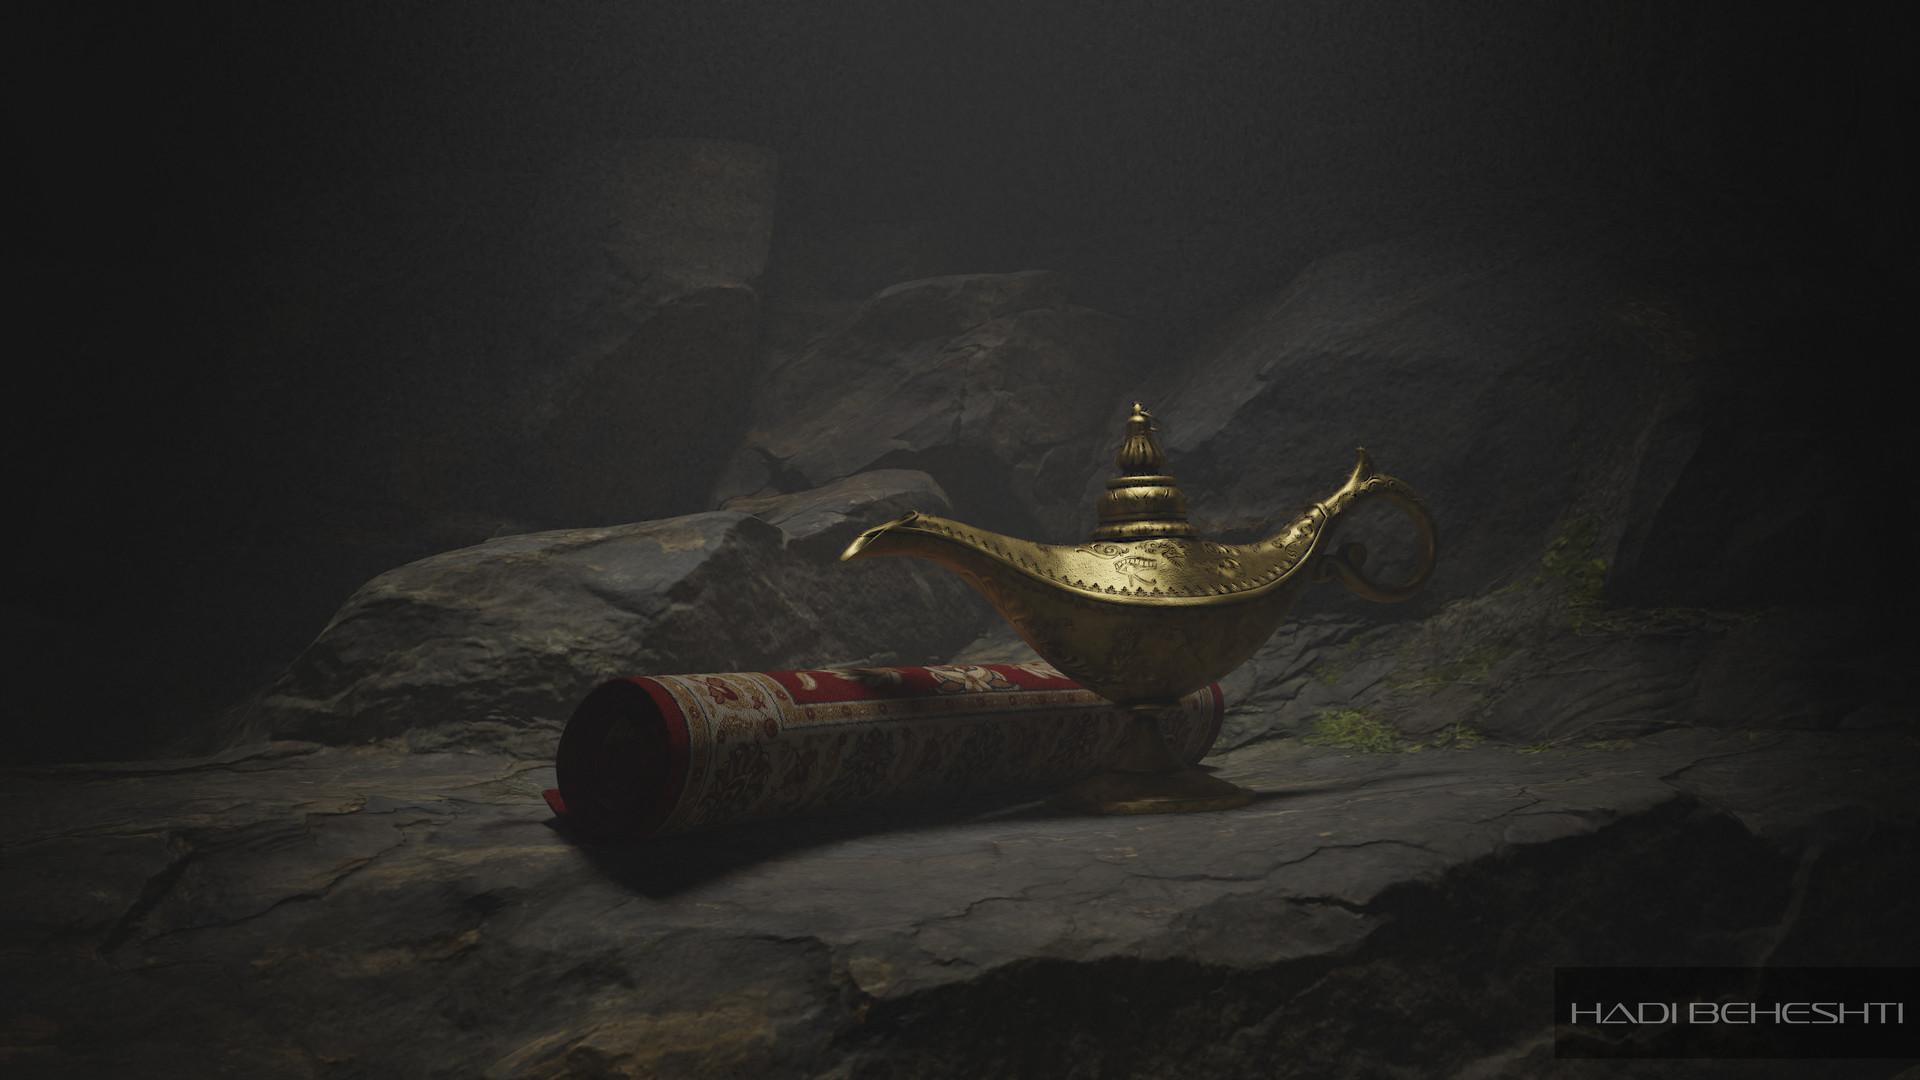 Hadi beheshti toplight with fog